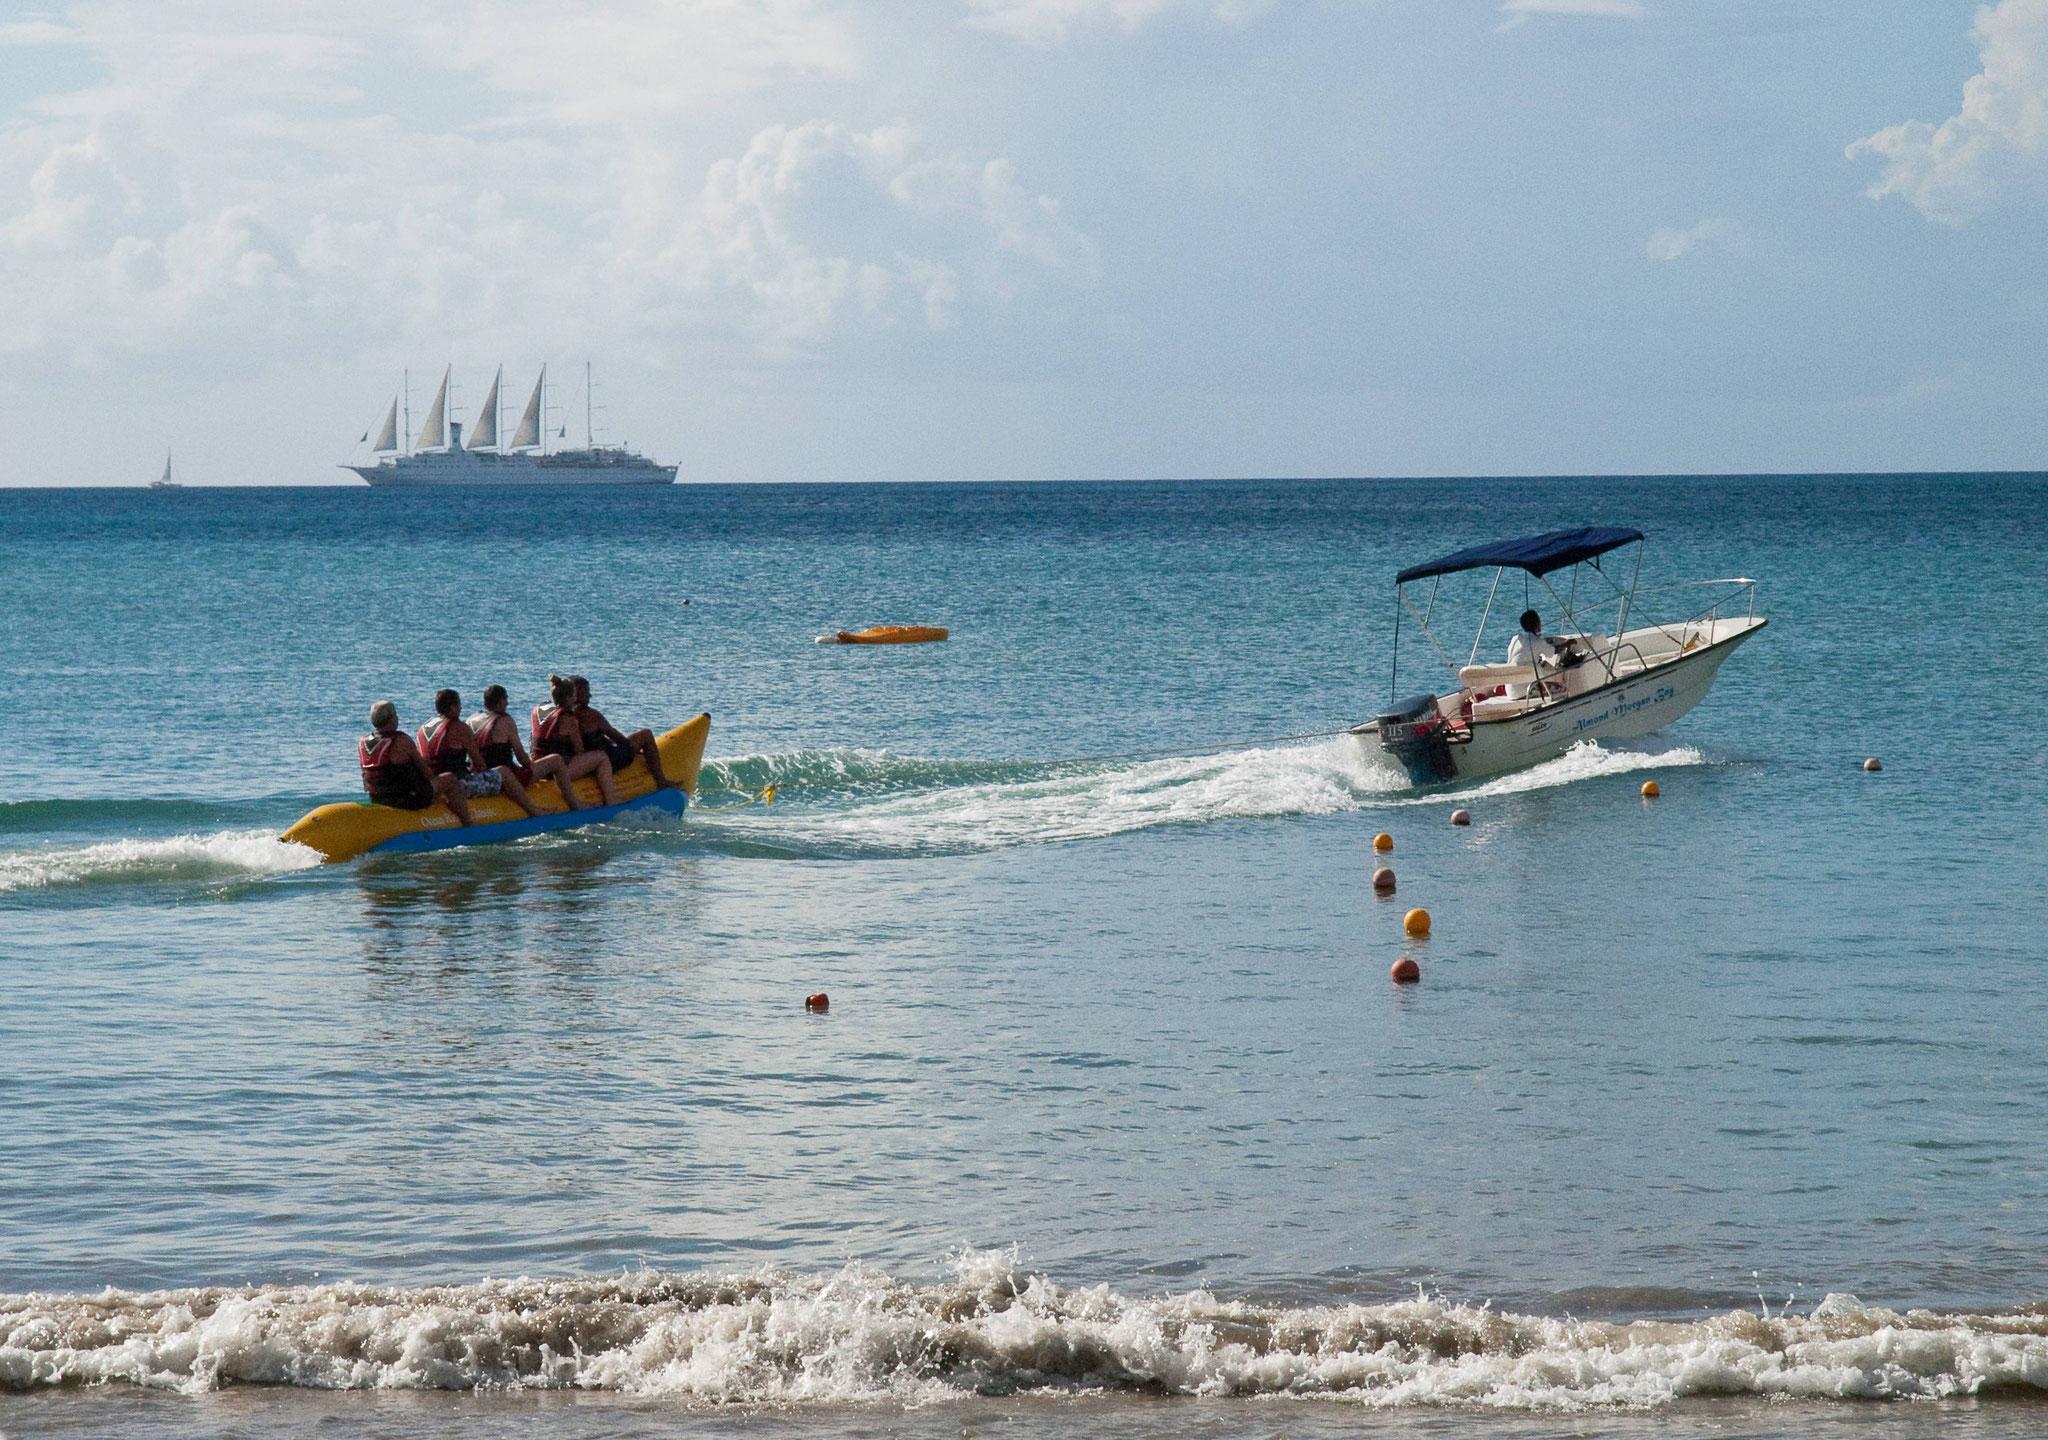 Morgan Bay, Wassersport